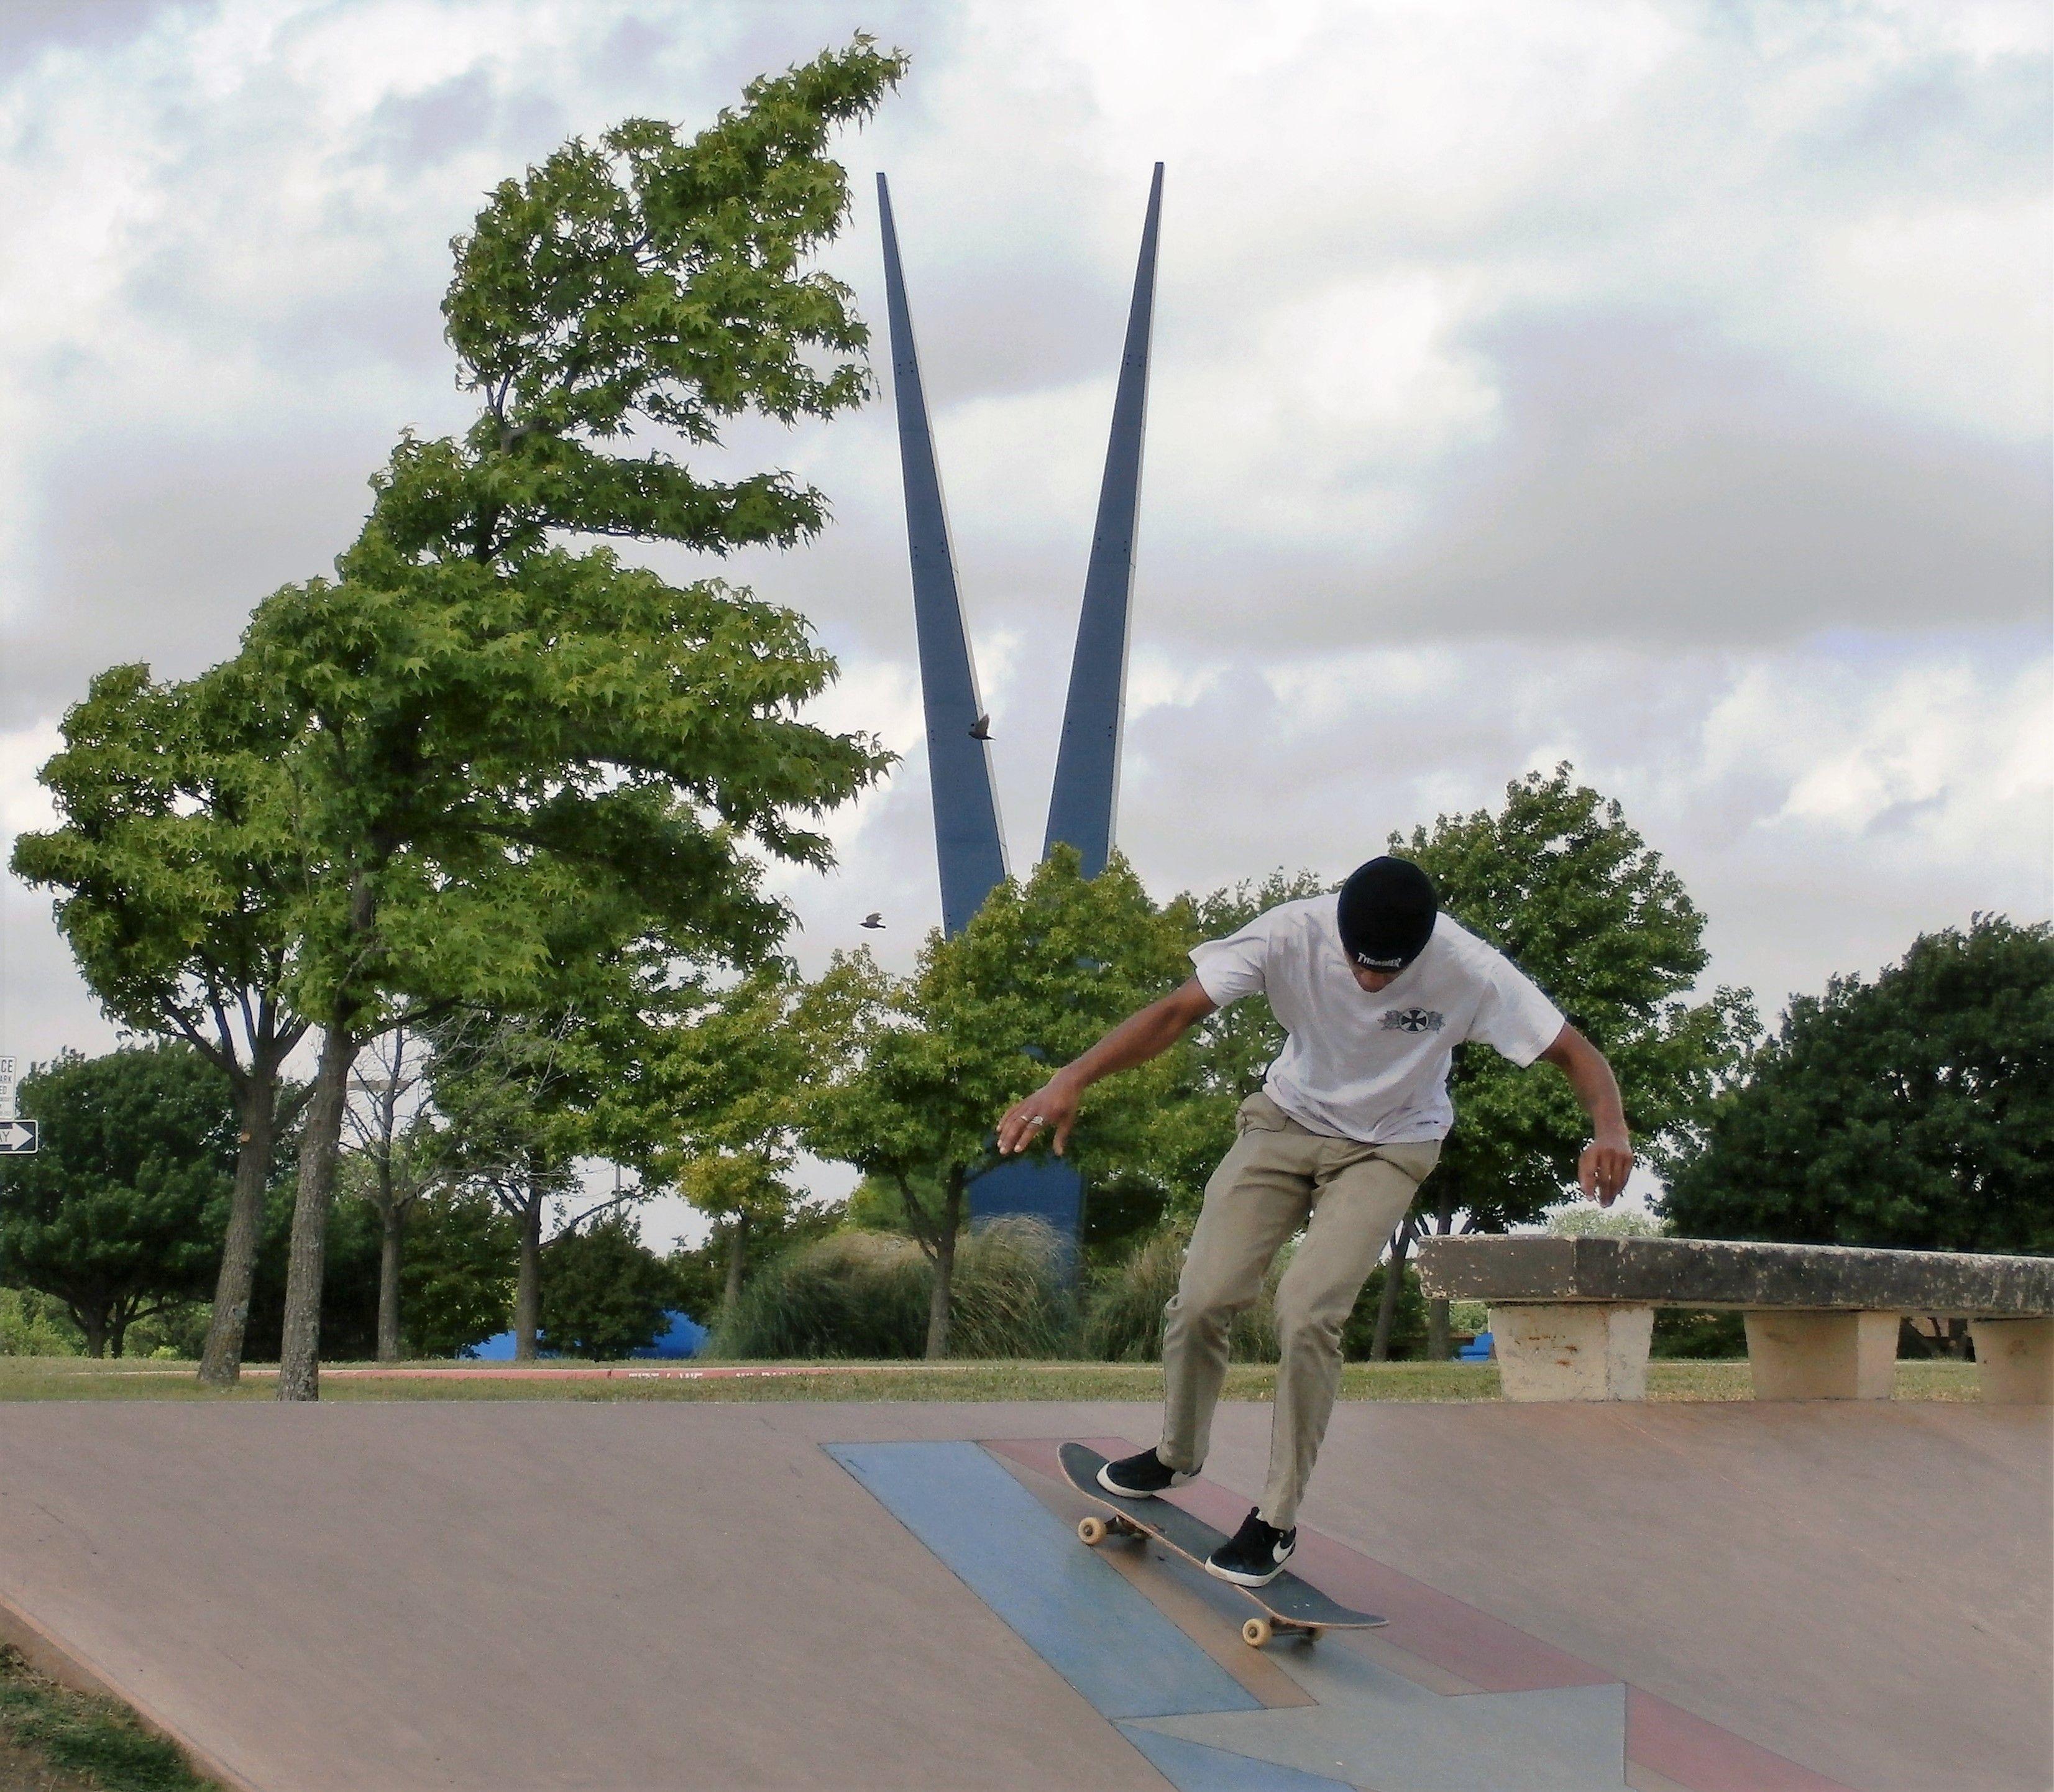 The Giant Green V In Vandergriff Park Was Once A Famed Commercial Landmark Of Vandergriff Chevrolet It Now Overlooks A Sk Arlington Park Public Art Skate Park